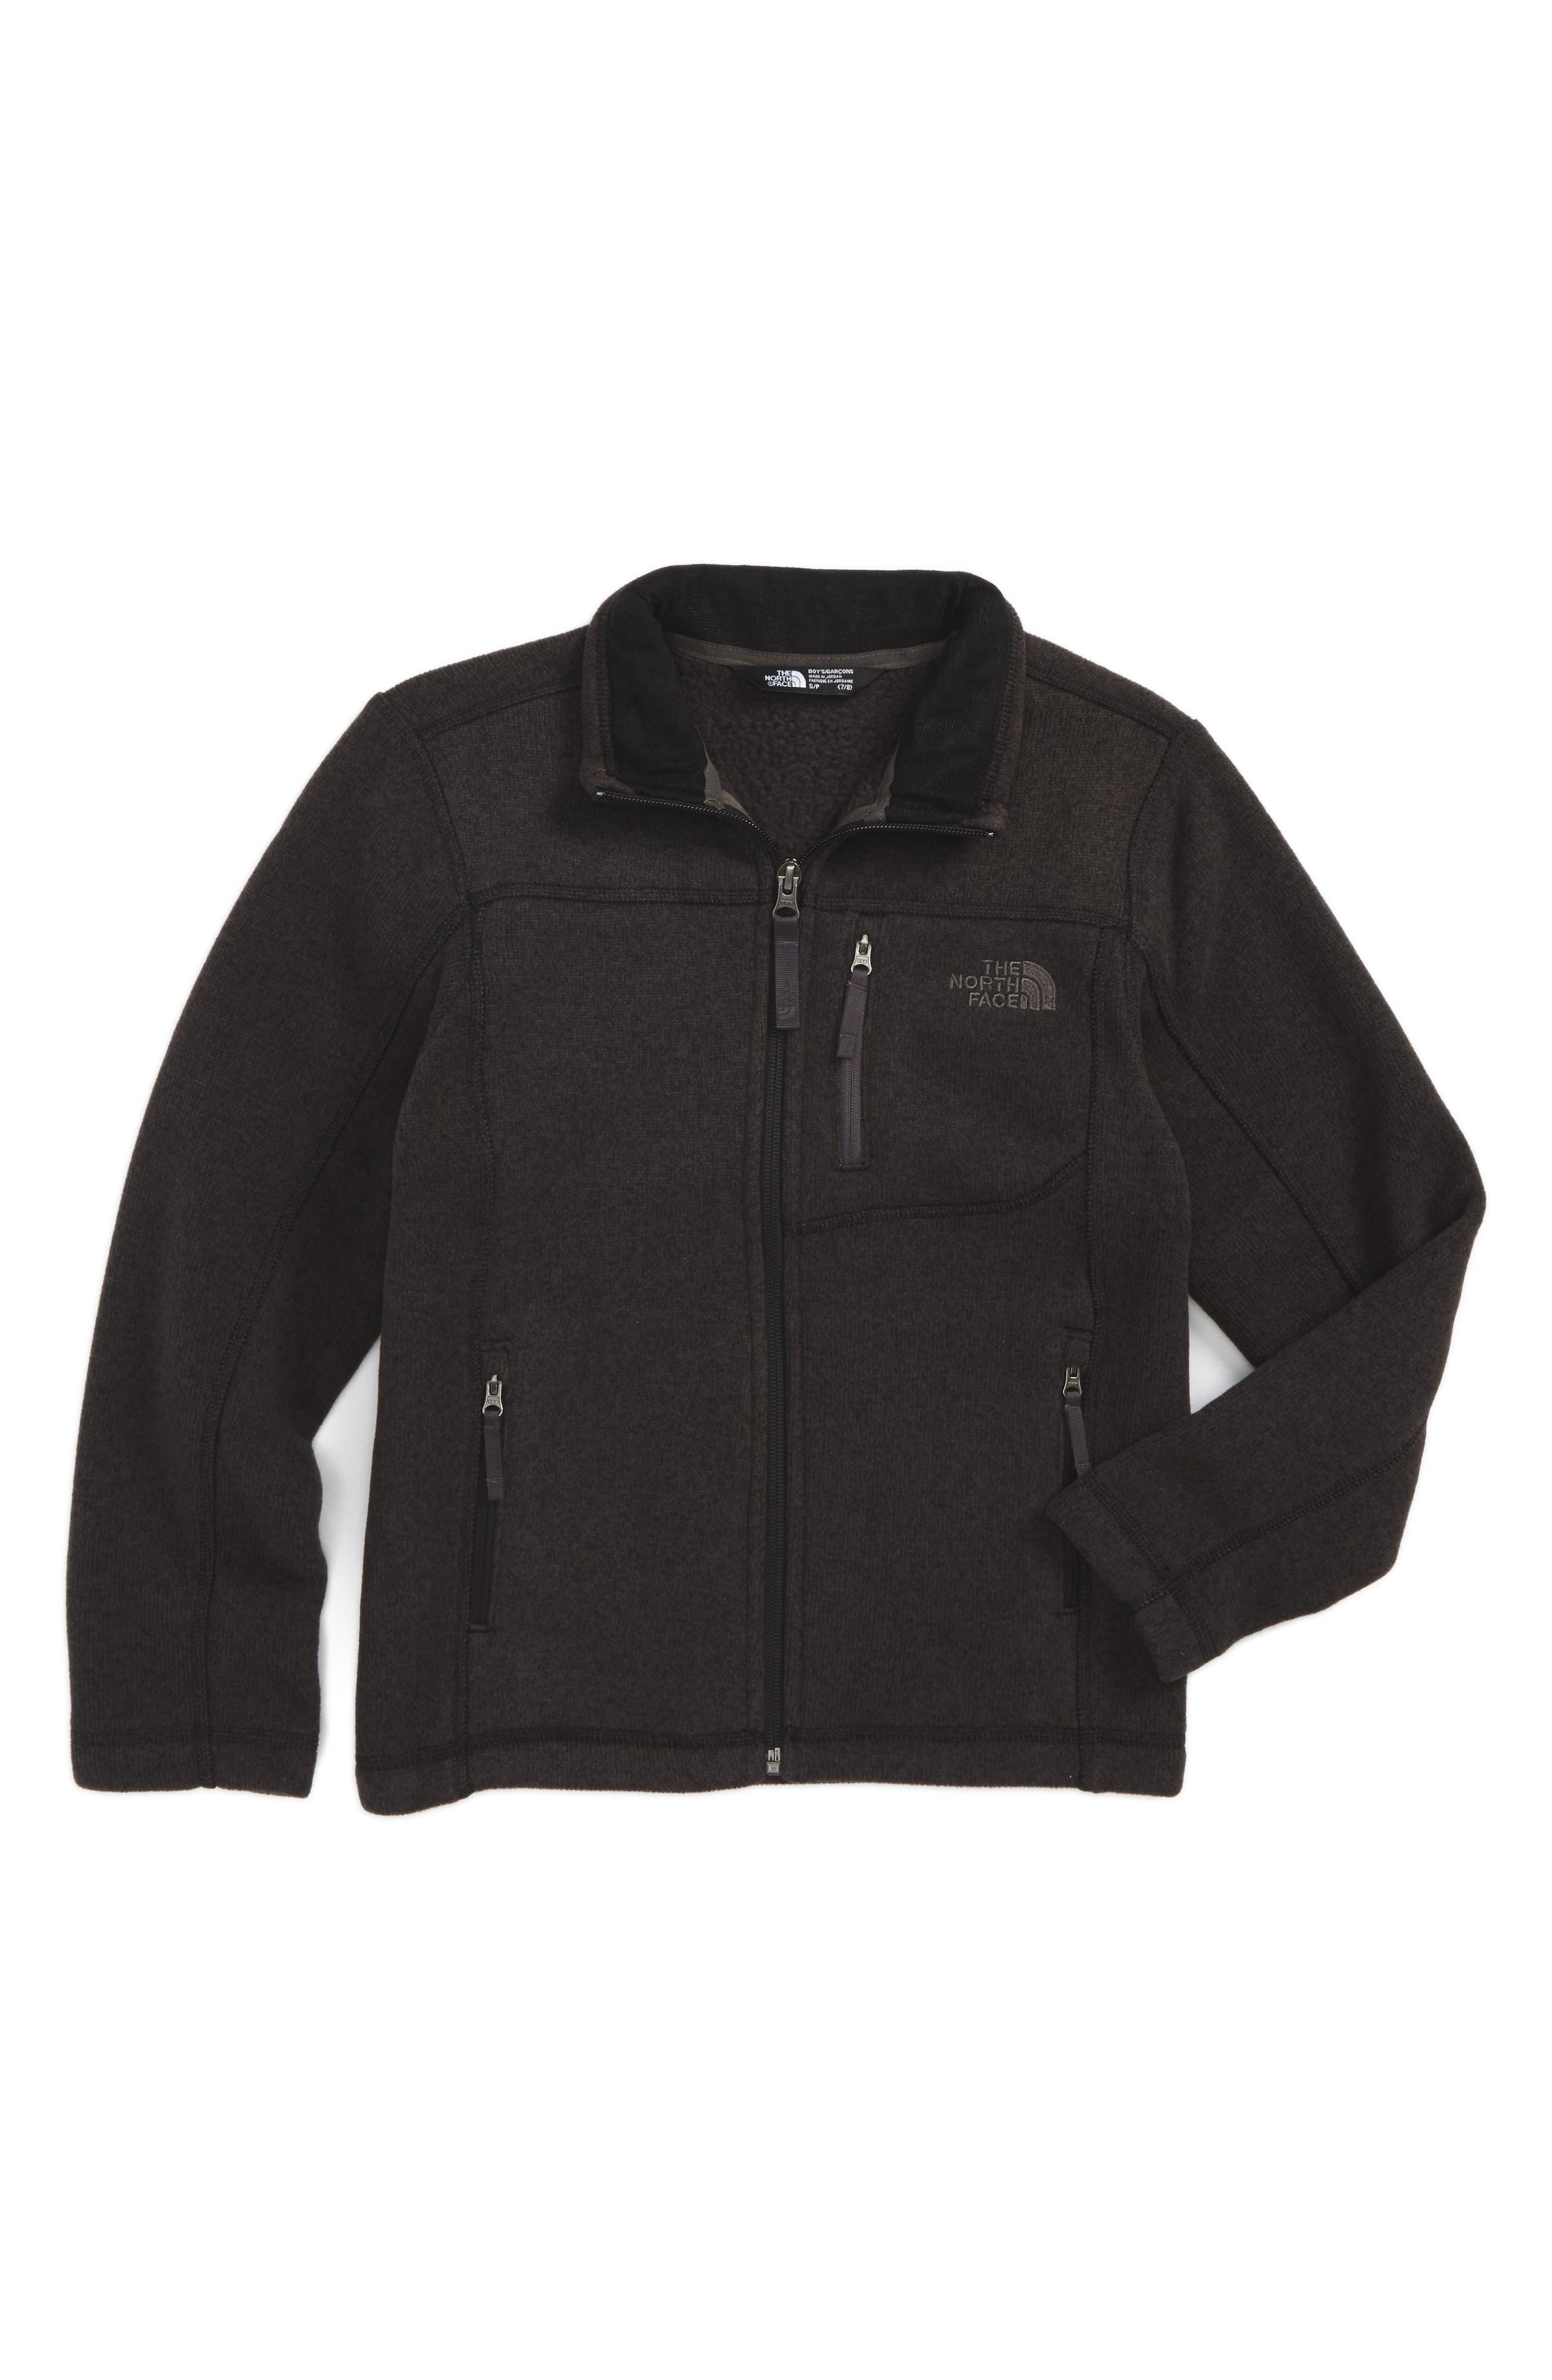 THE NORTH FACE, Gordon Lyons Sweater Fleece Zip Jacket, Main thumbnail 1, color, 025